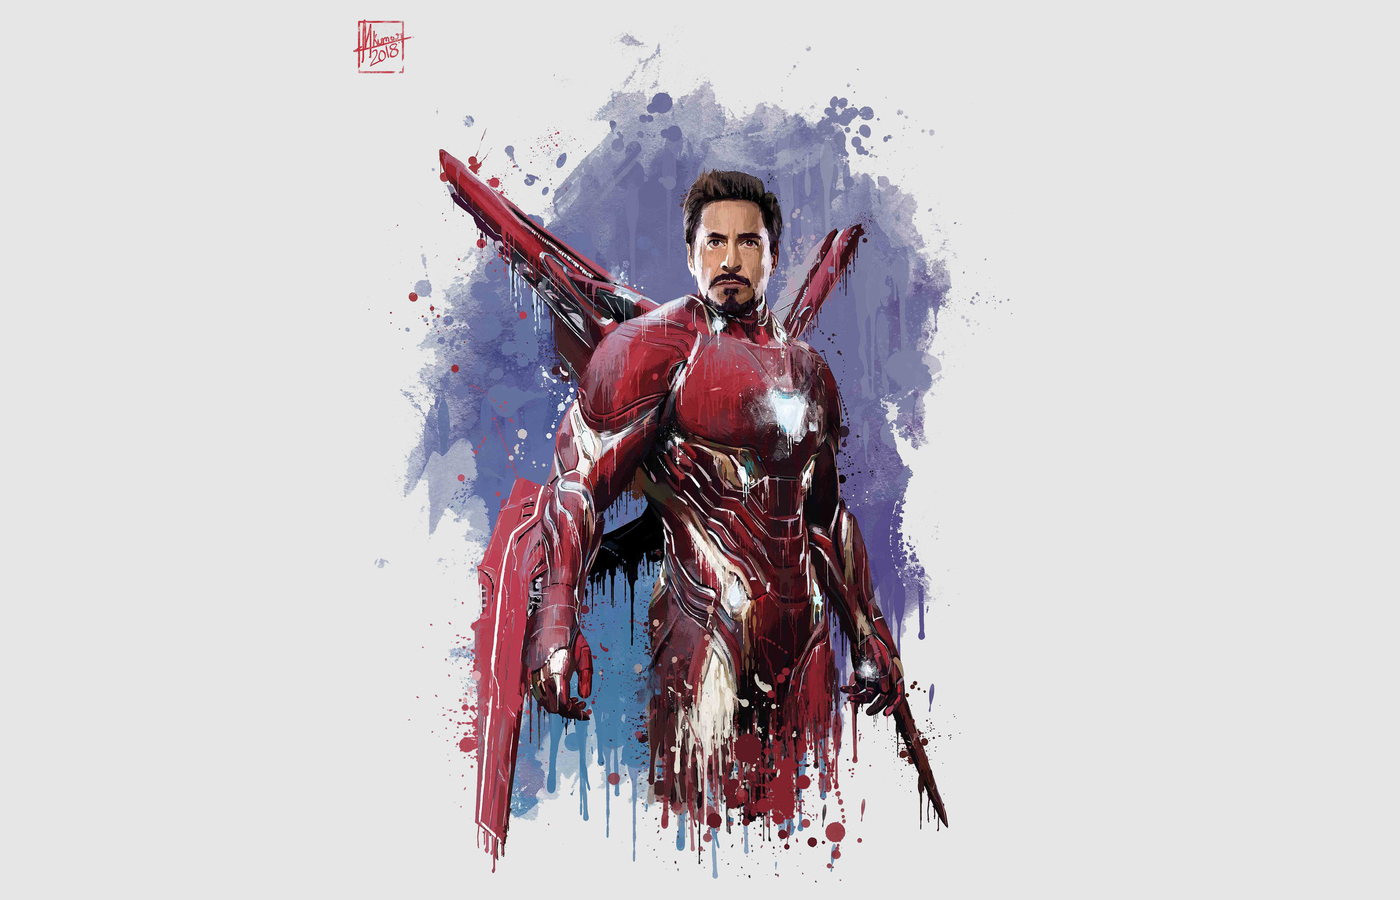 iron-man-new-suit-for-avengers-infinity-war-vi.jpg